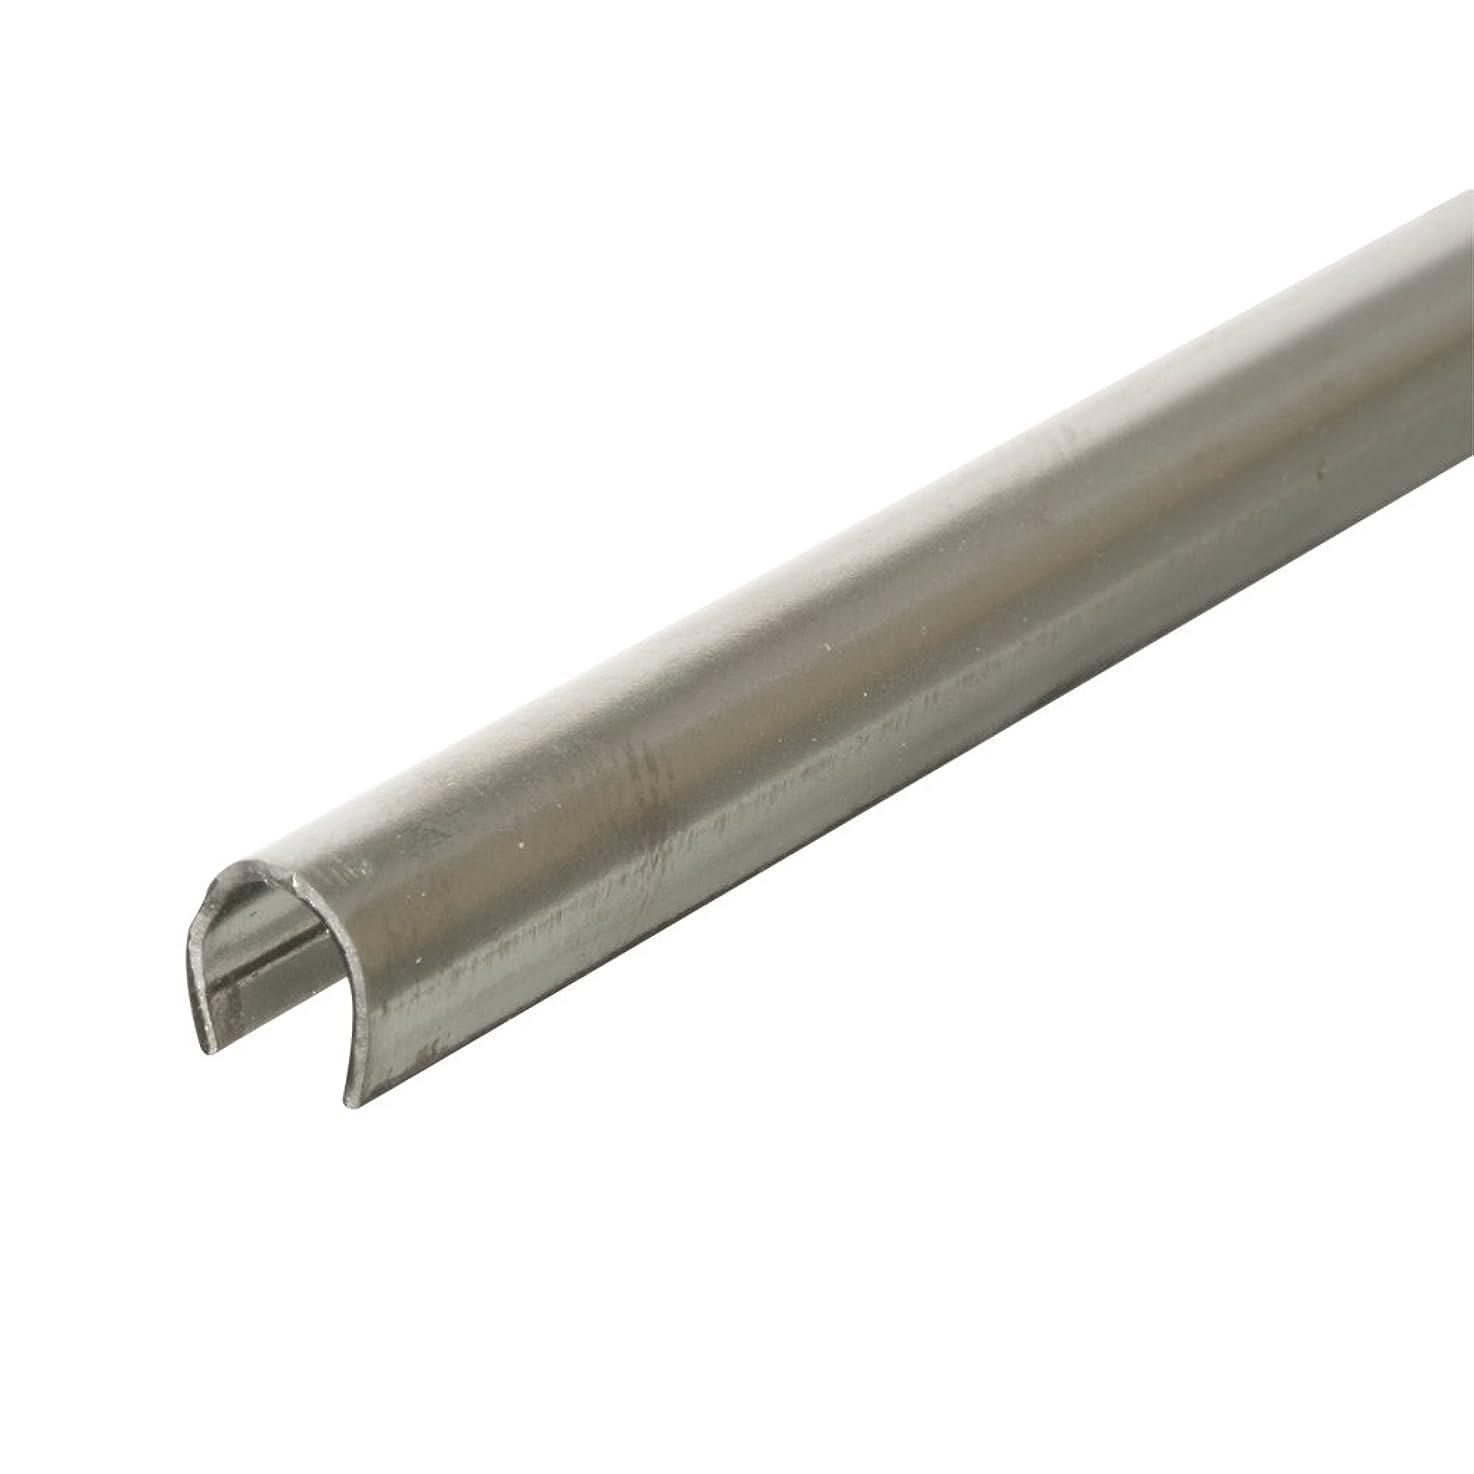 "PRIME-LINE D 1579-1 Sliding Door Repair Track – Repair Worn or Damaged Sliding Glass Door Aluminum Tracks and Horizontal Sliding Window Tracks, 1/4"" x 8', Stainless Steel"